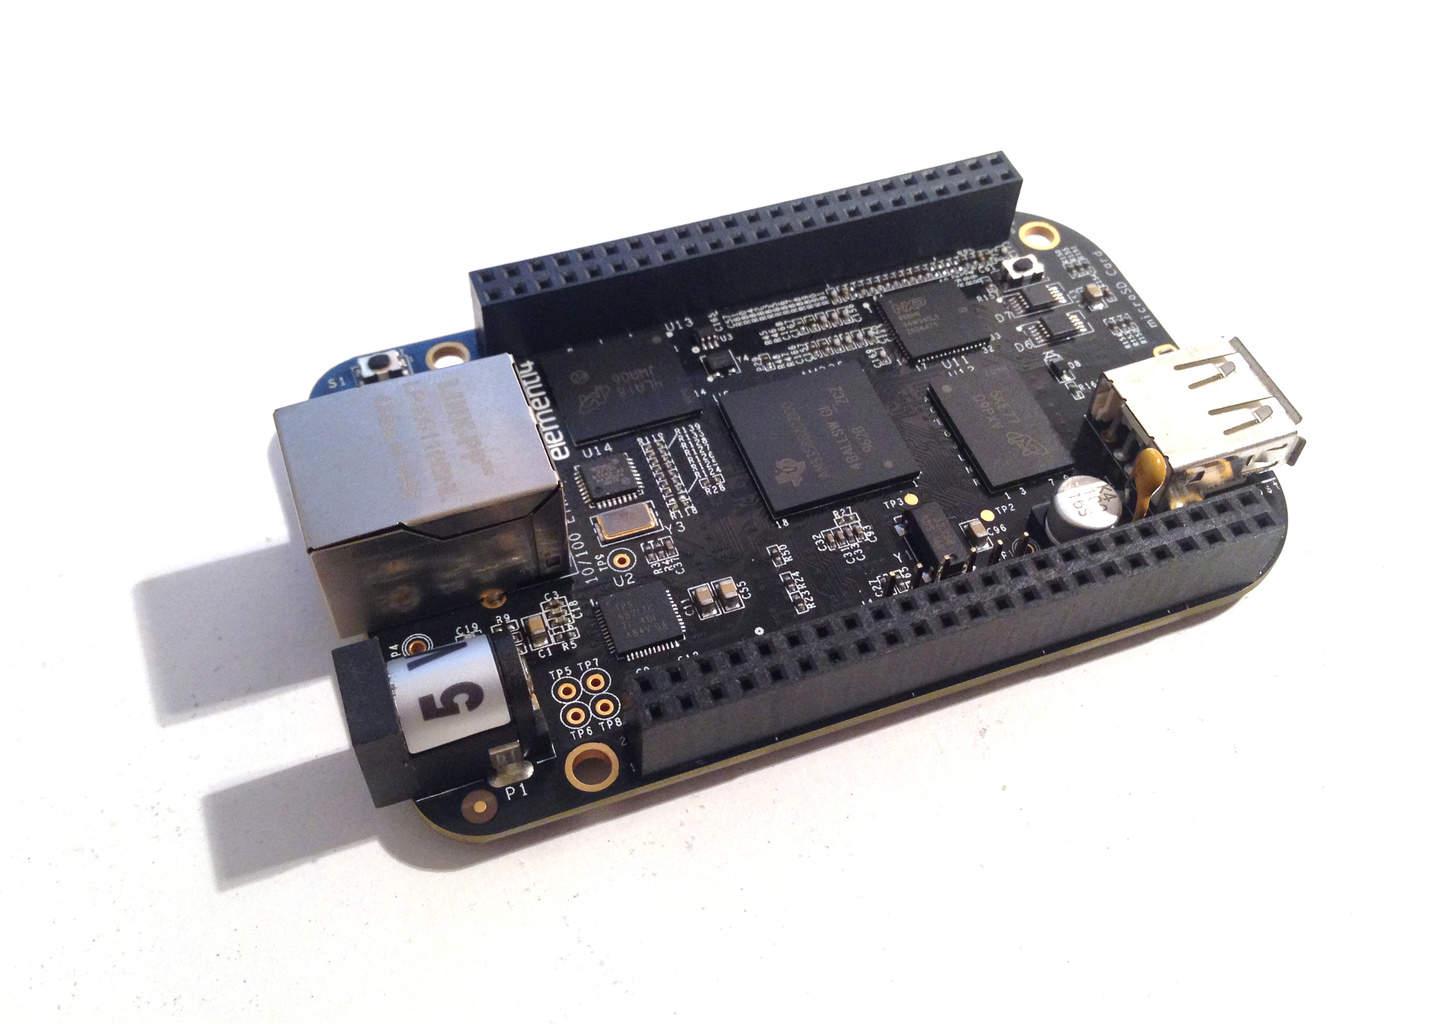 What is BeagleBone? - Build Electronic Circuits